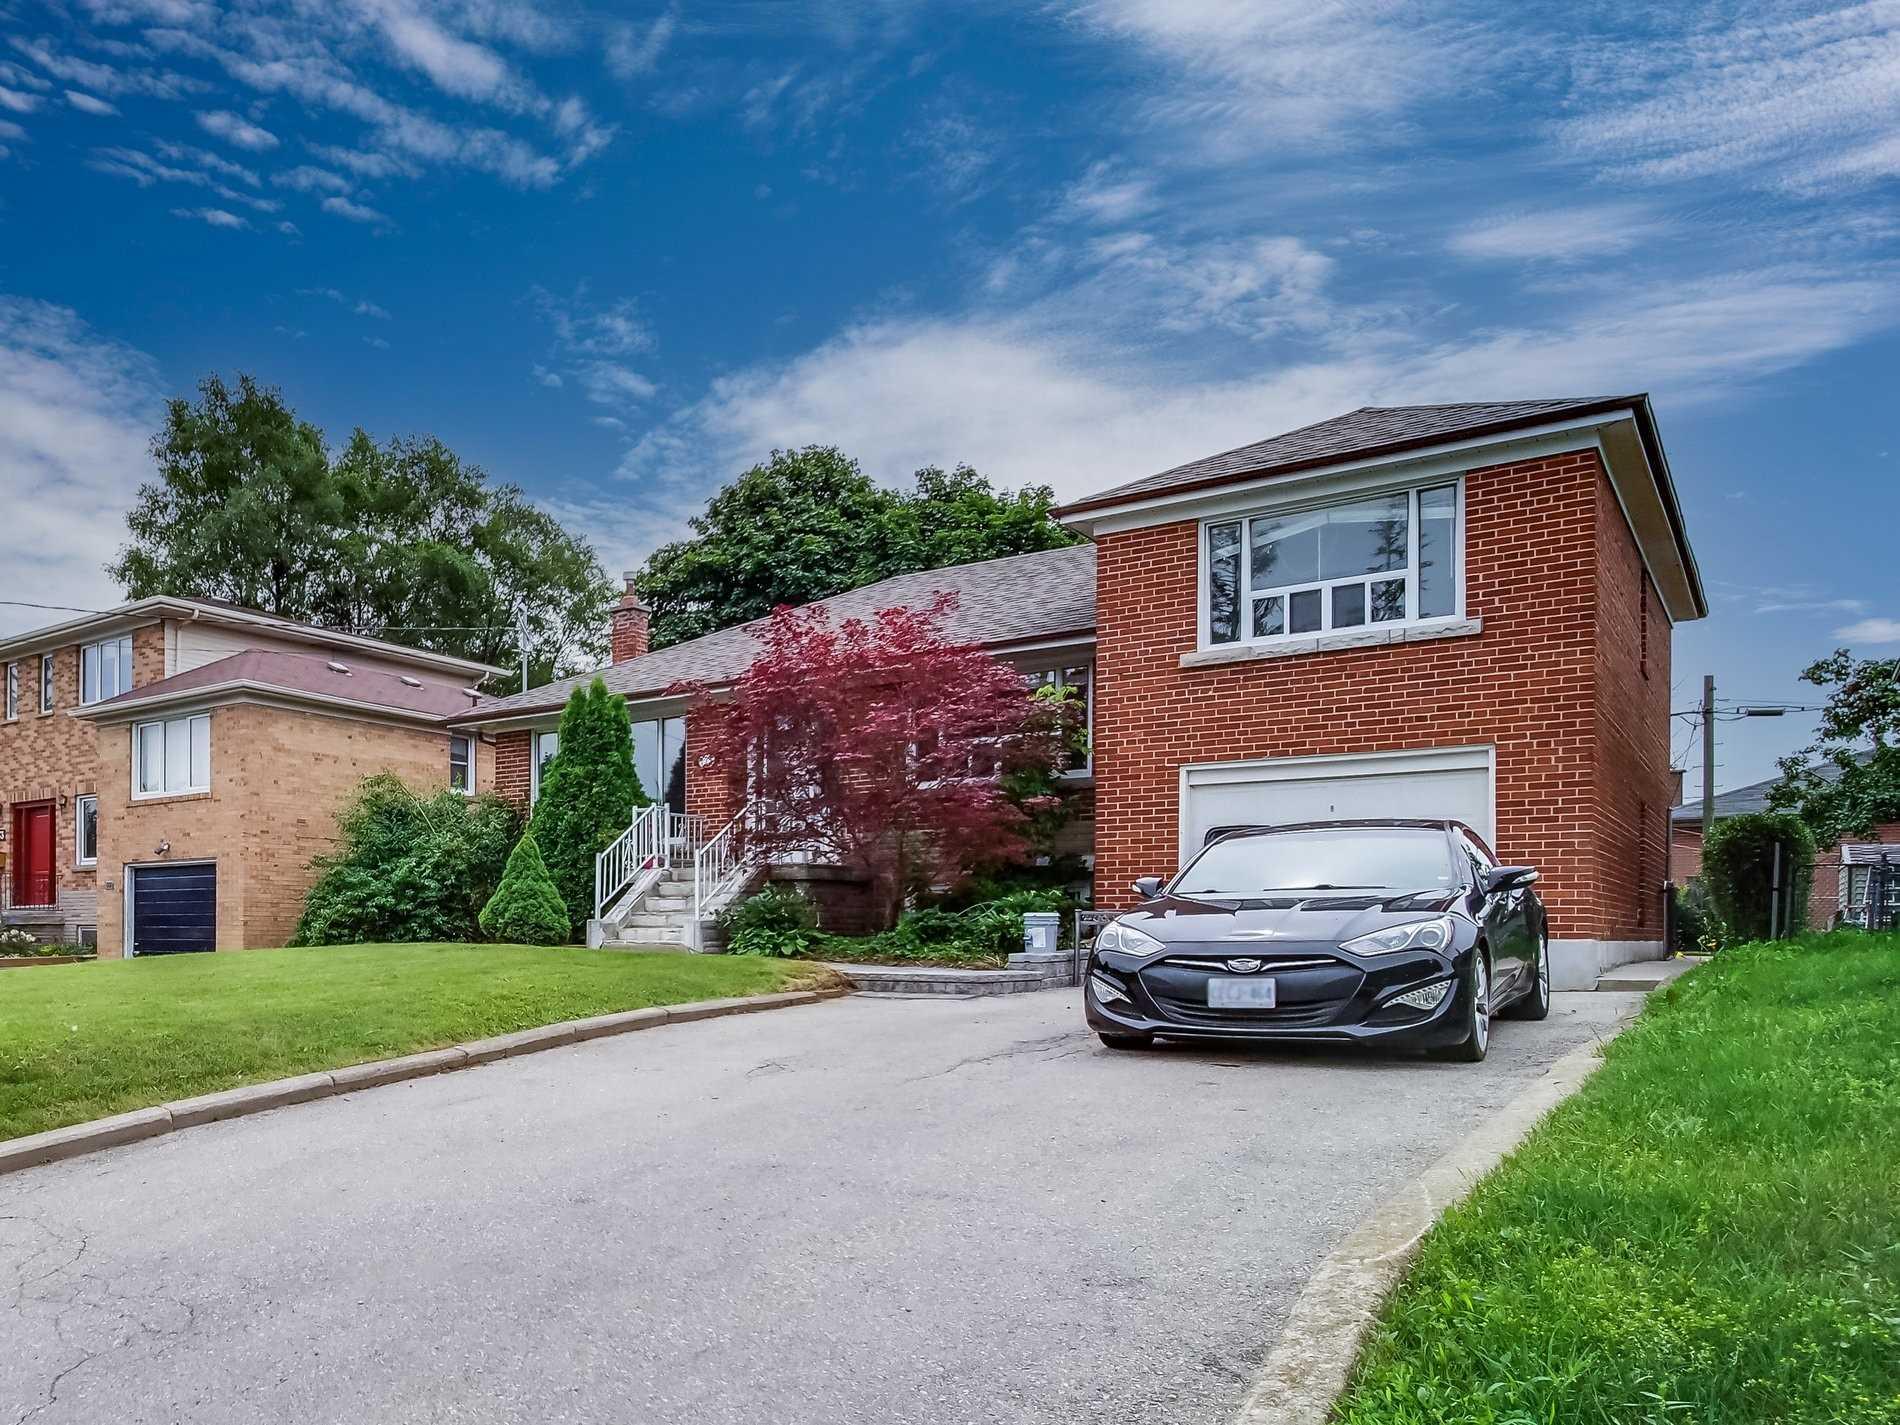 175 Brighton Ave - Bathurst Manor Detached for sale, 3 Bedrooms (C5322889) - #1